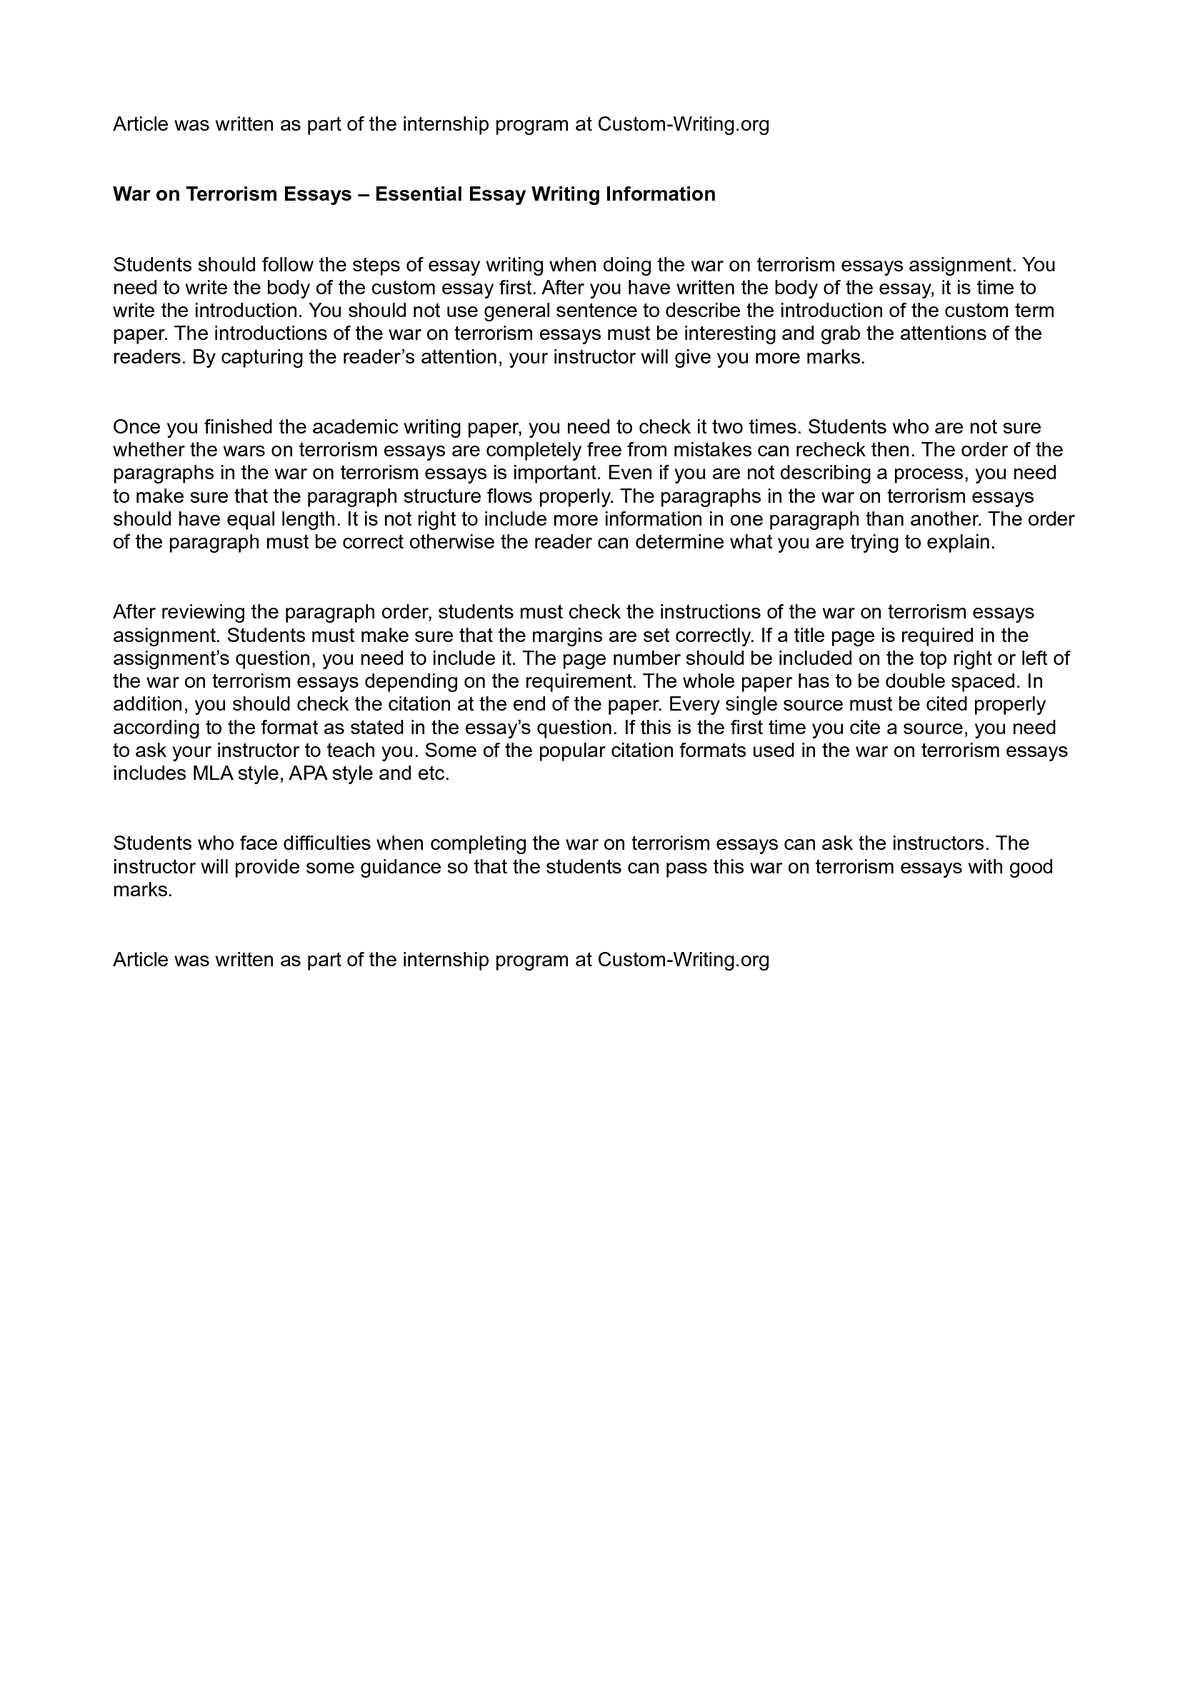 011 Terrorism Essay P1 Wonderful Topics In English War On Full